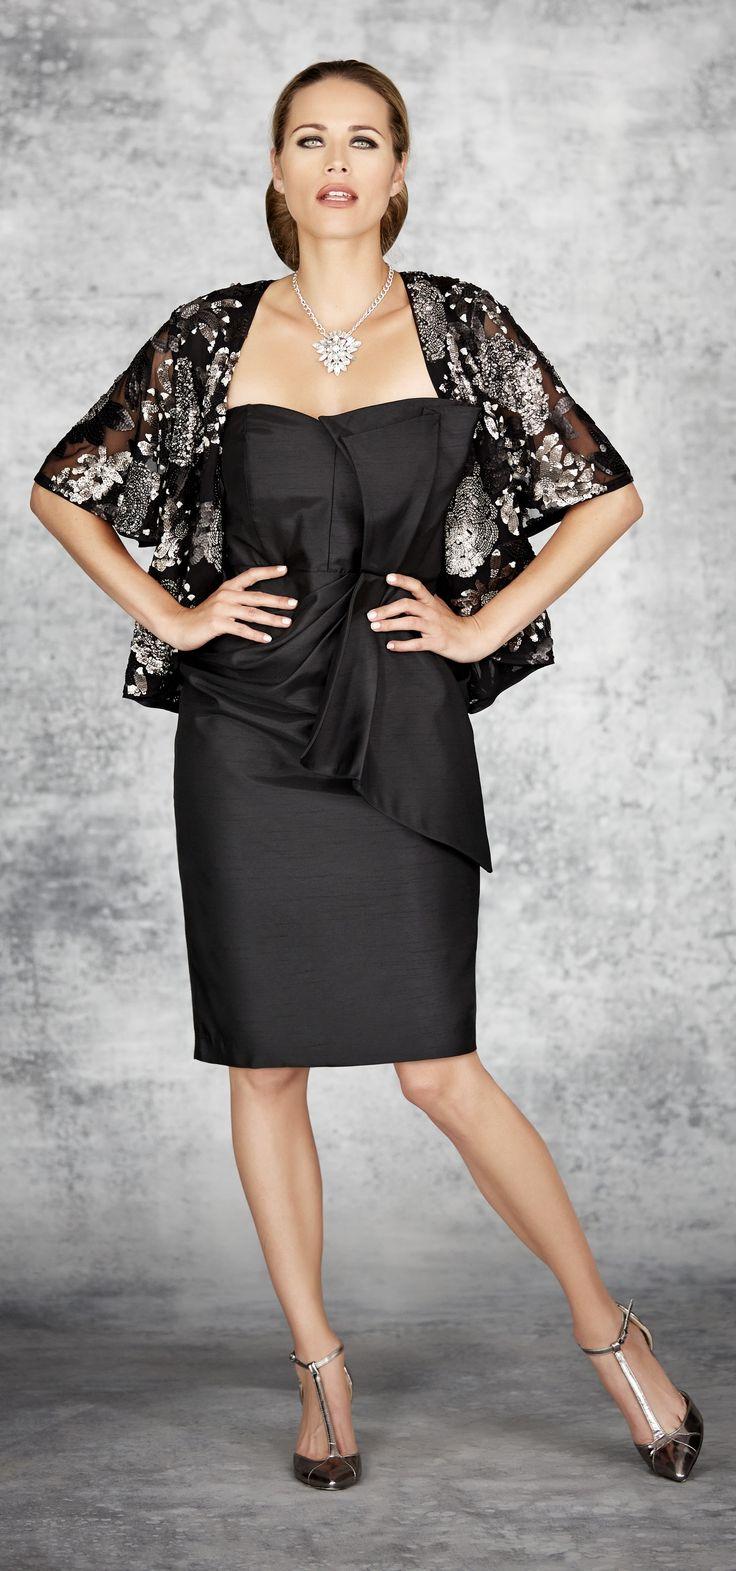 367 best images about * SHOES for Women Over 40, 50, 60 on Pinterest   Older women, Boho dress ...